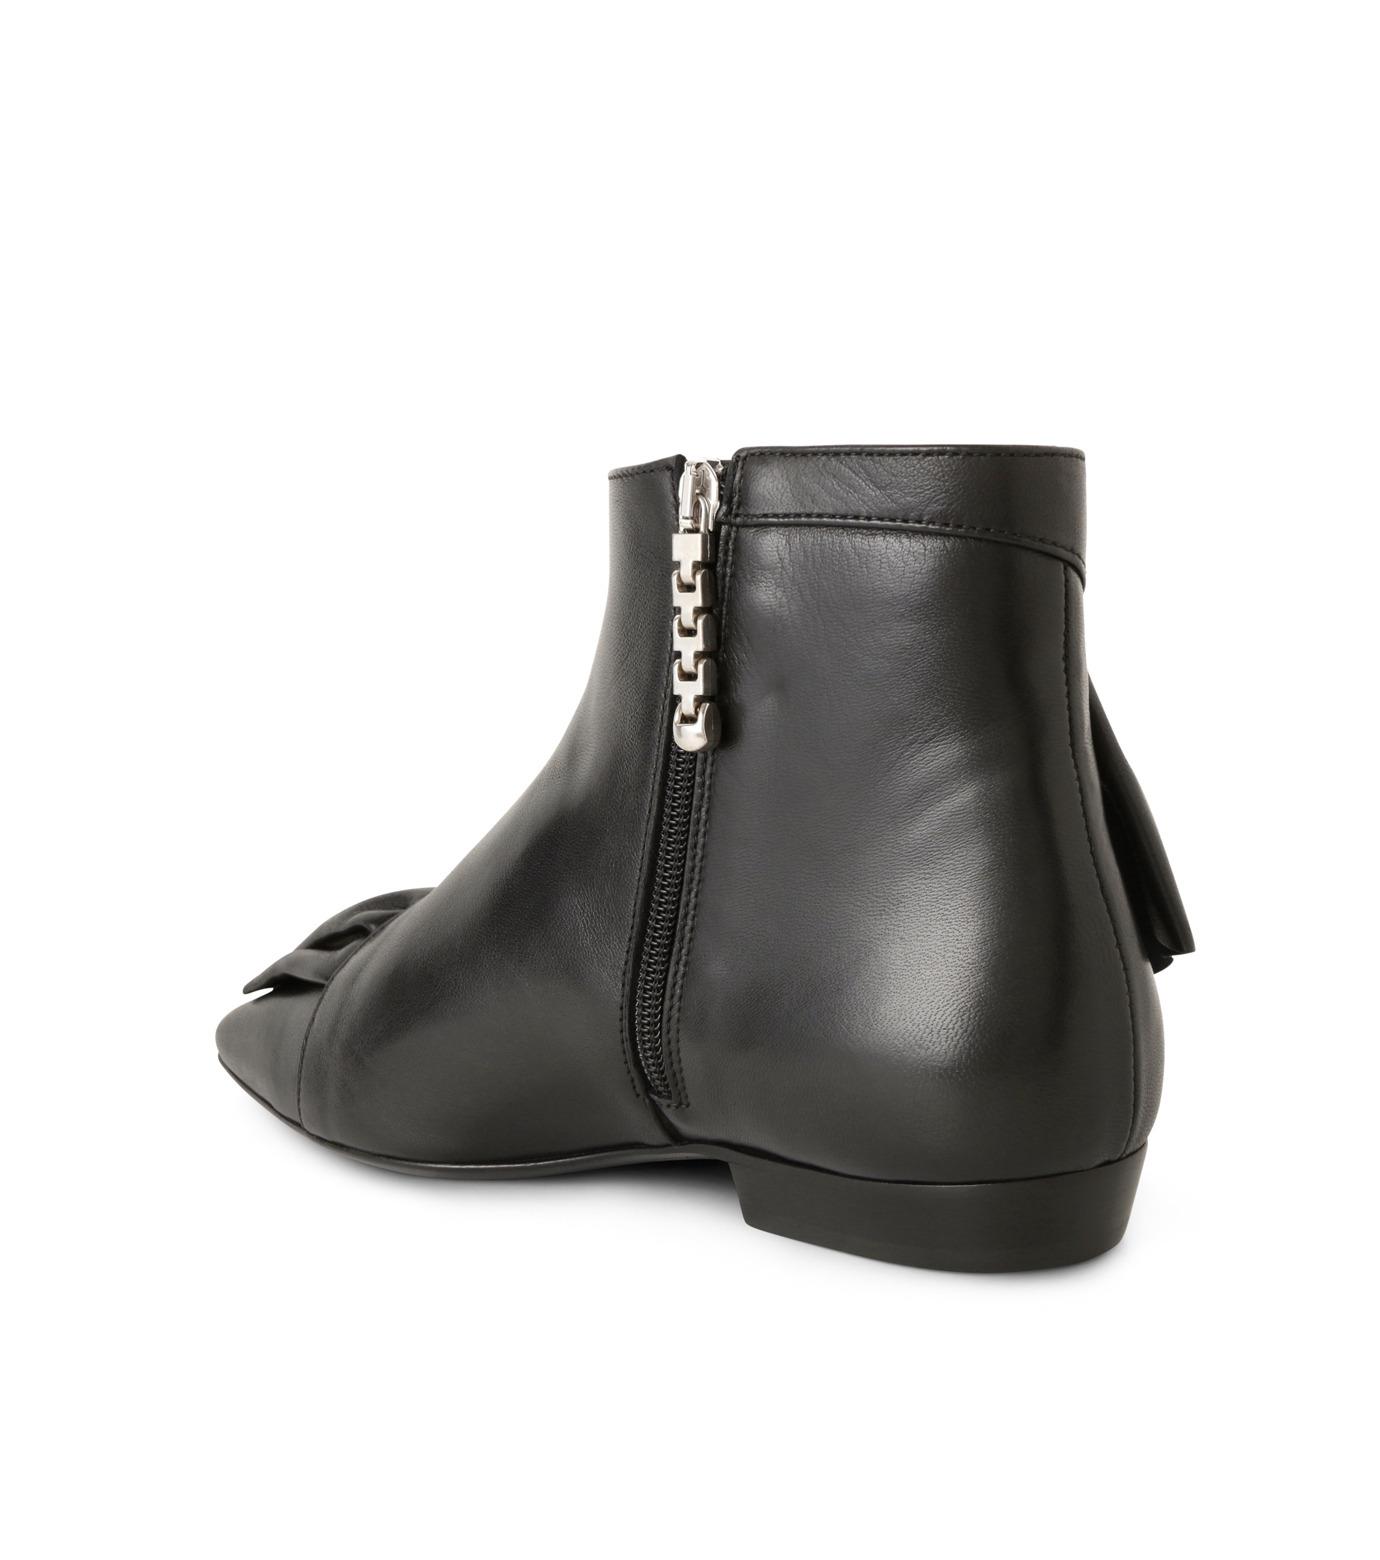 J.W.Anderson(ジェイダブリュー アンダーソン)のRuffle Bootie-BLACK(ブーツ/boots)-JWAFW01C-13 拡大詳細画像2